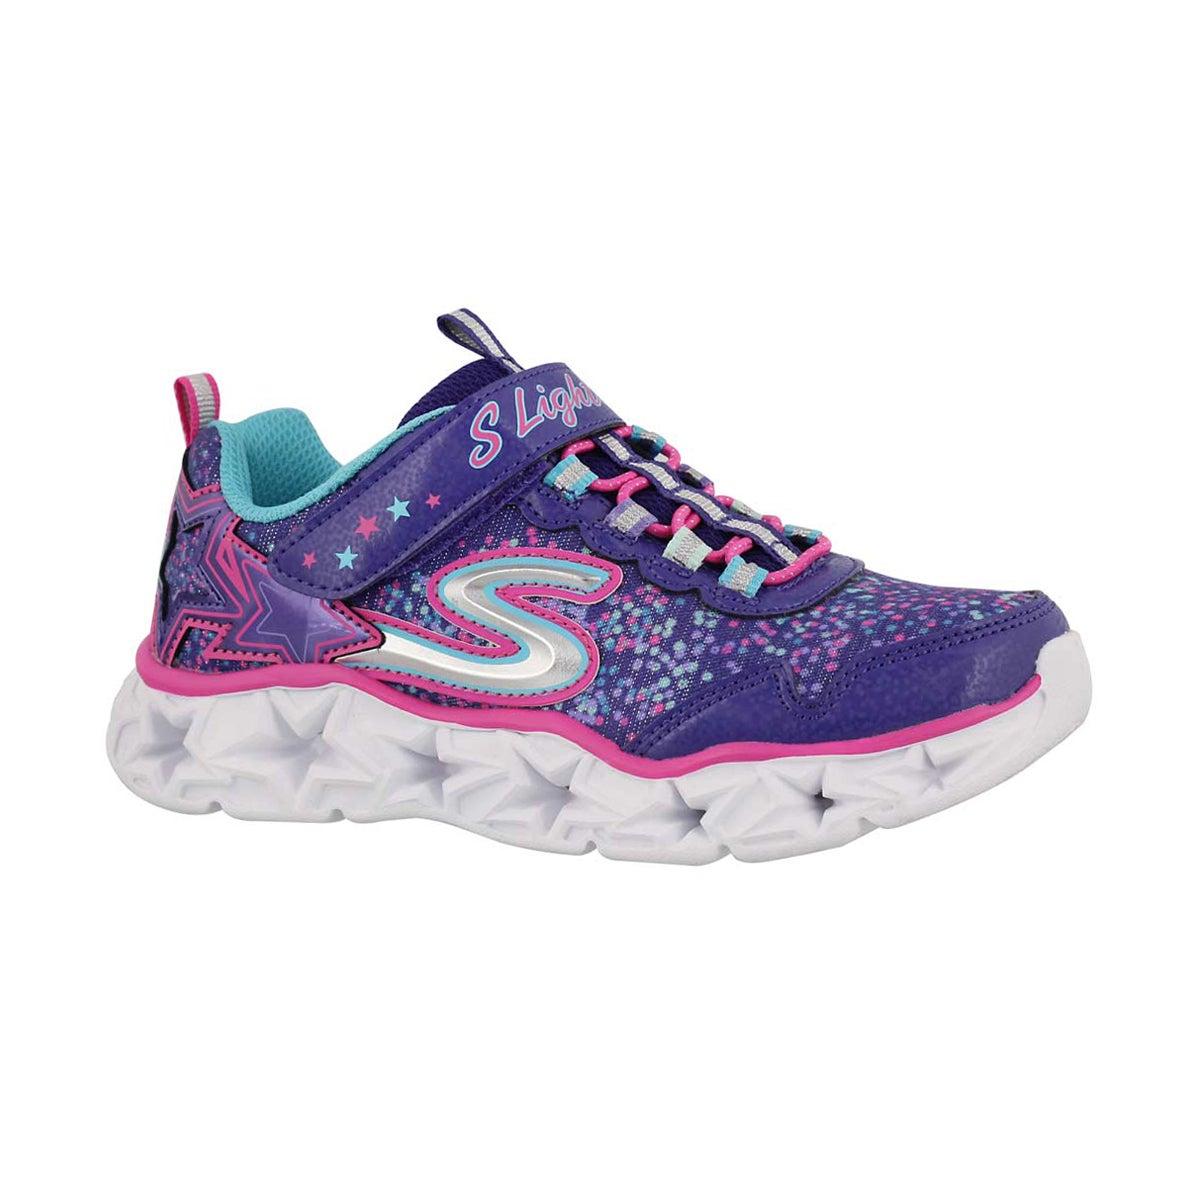 Girls' GALAXY LIGHTS purple/mult light up sneakers